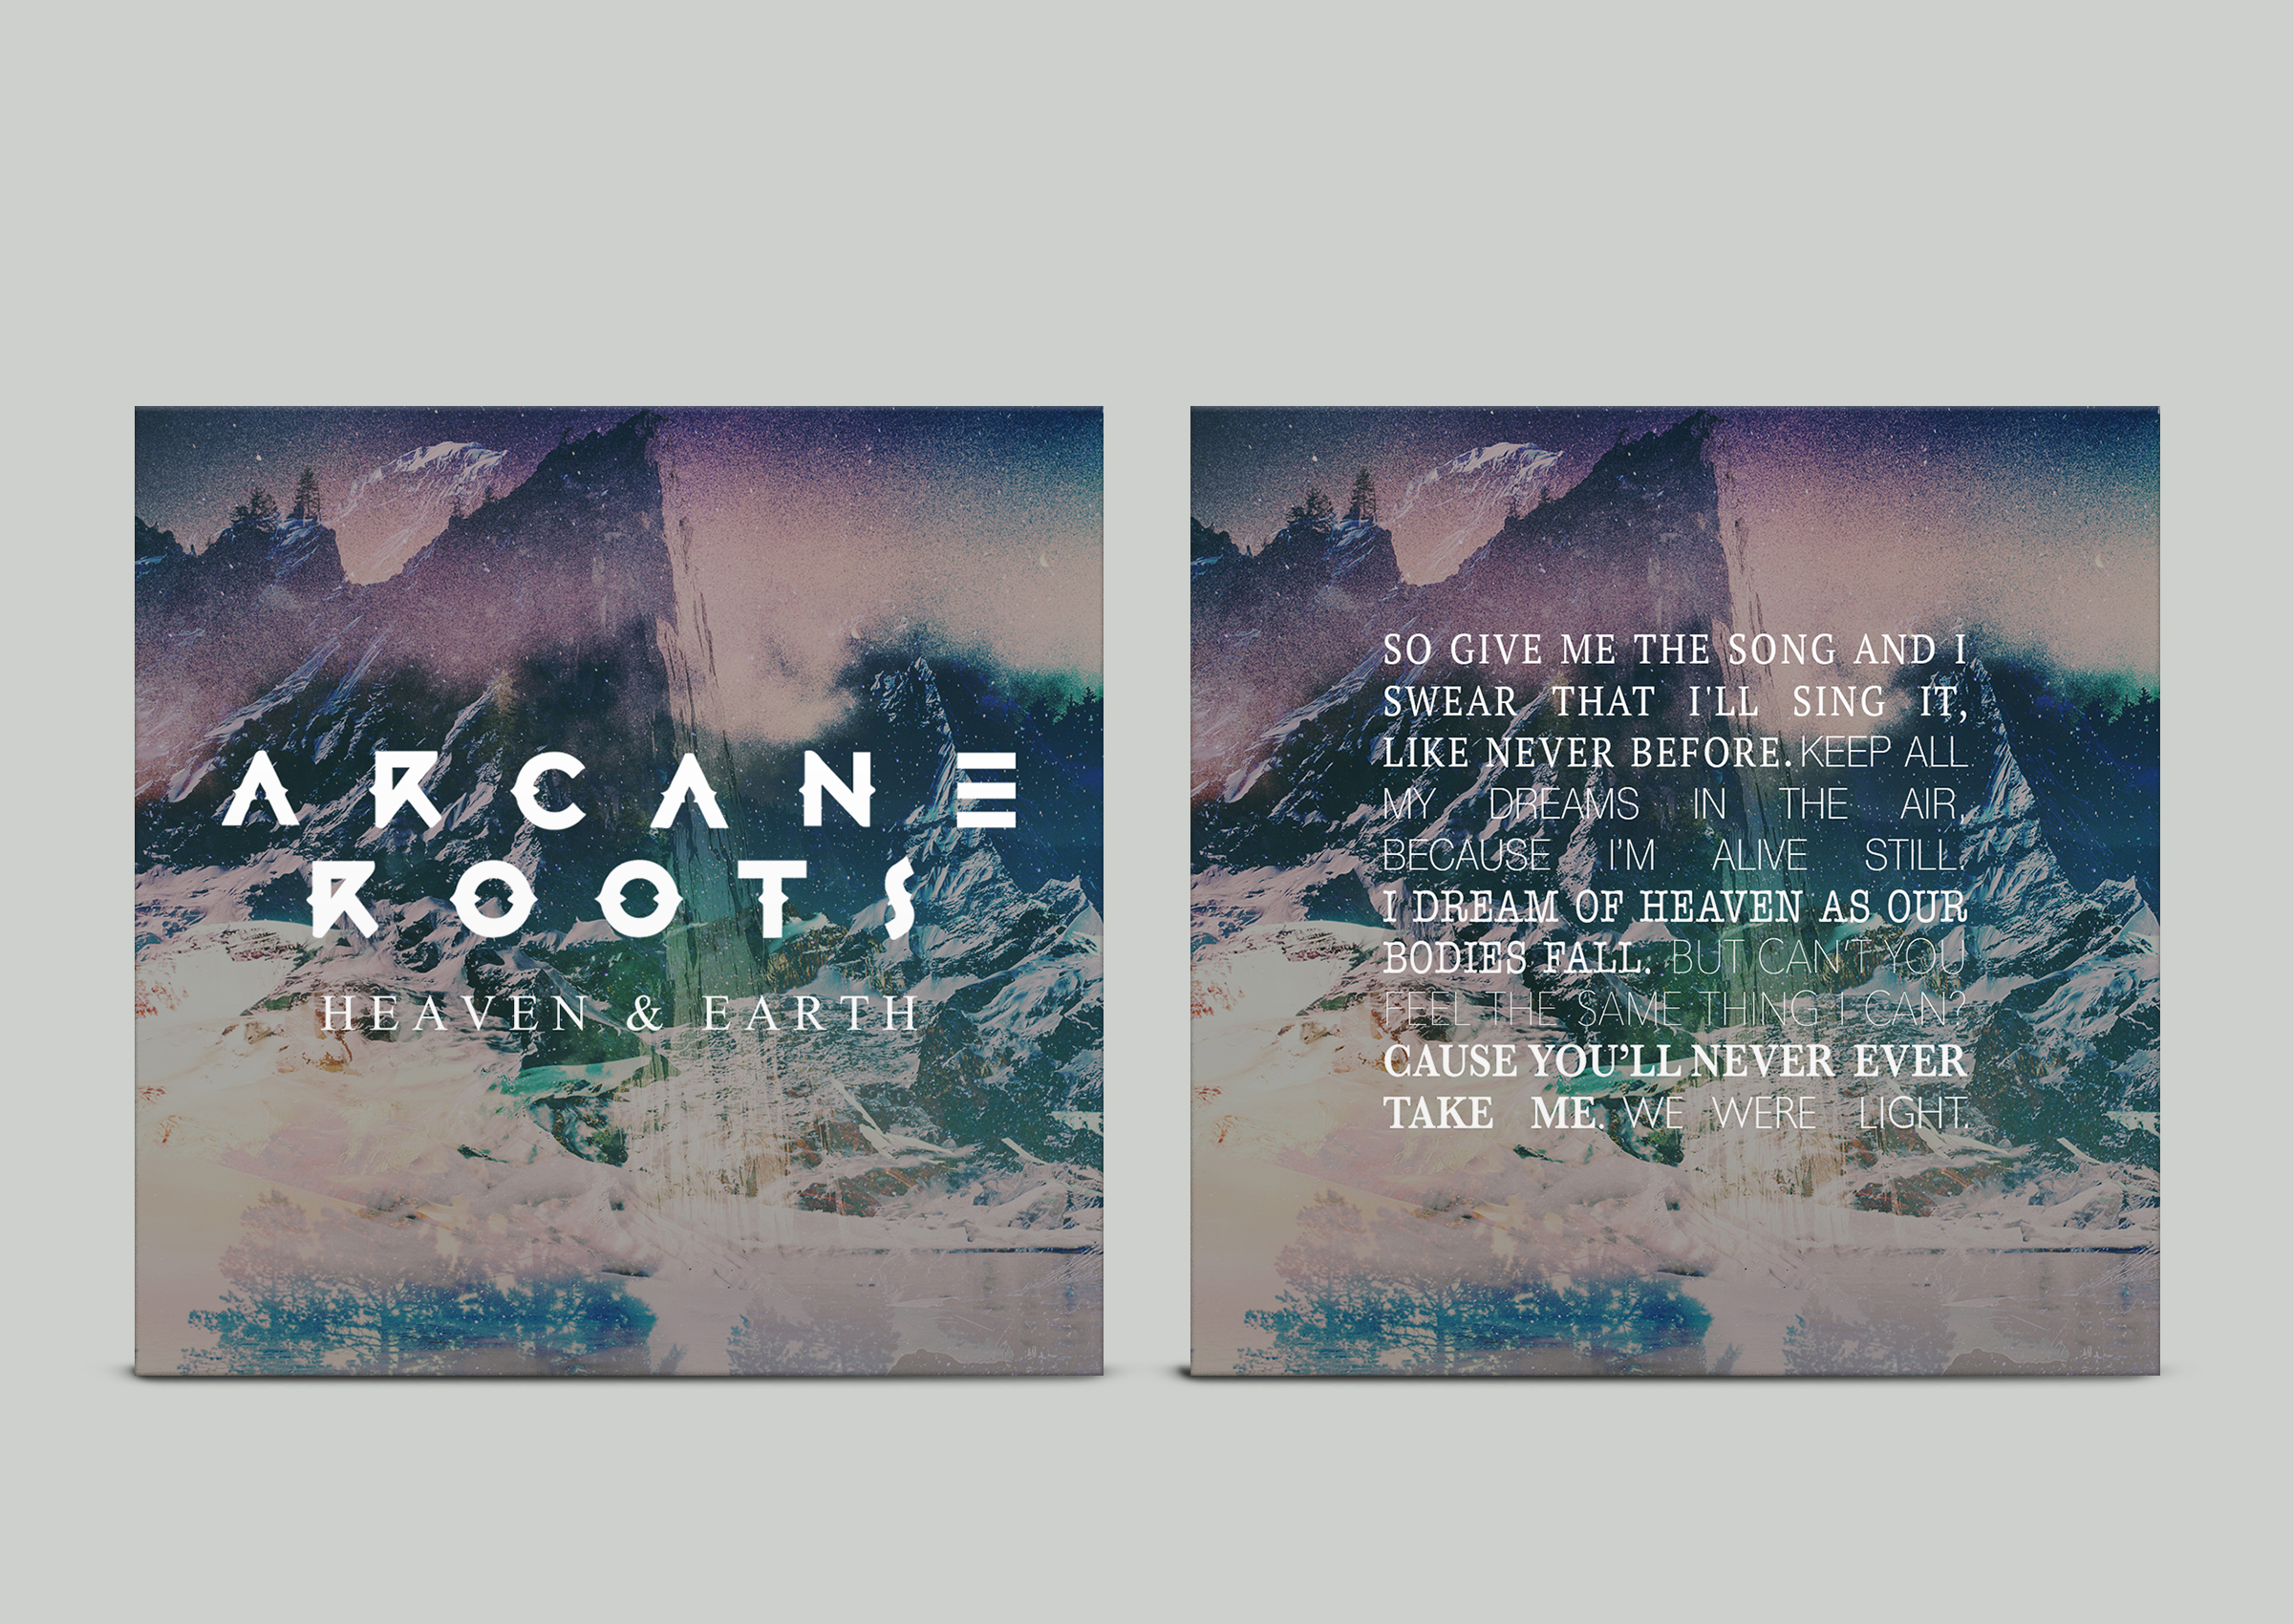 ARCANE ROOTS 'HEAVEN & EARTH' INSERT